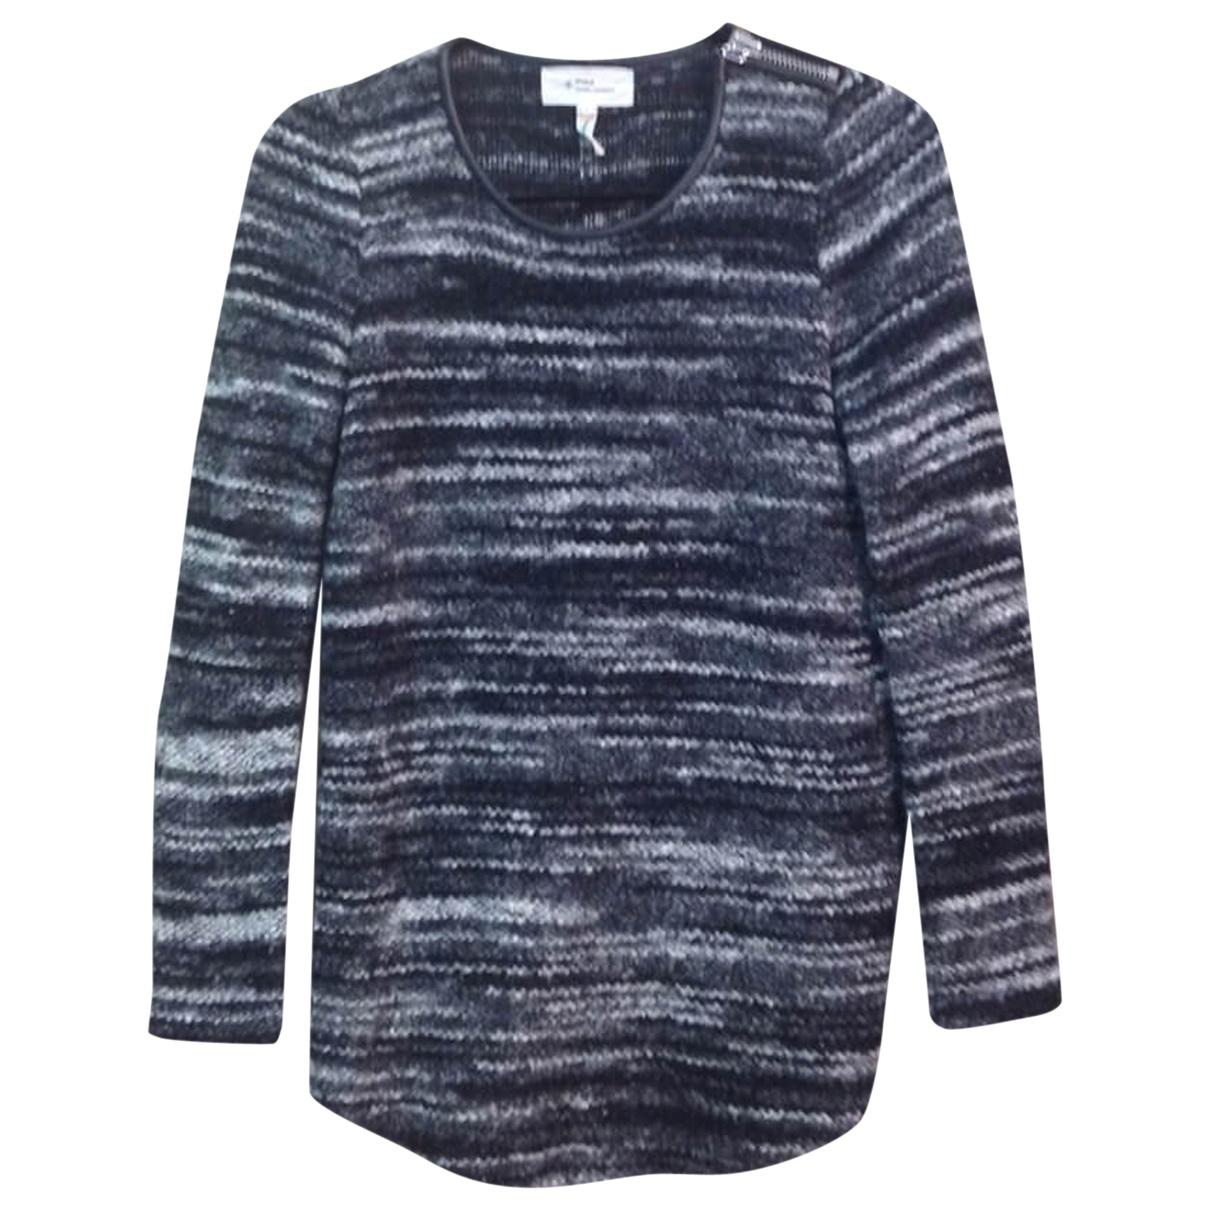 Isabel Marant Etoile - Pull   pour femme en laine - anthracite